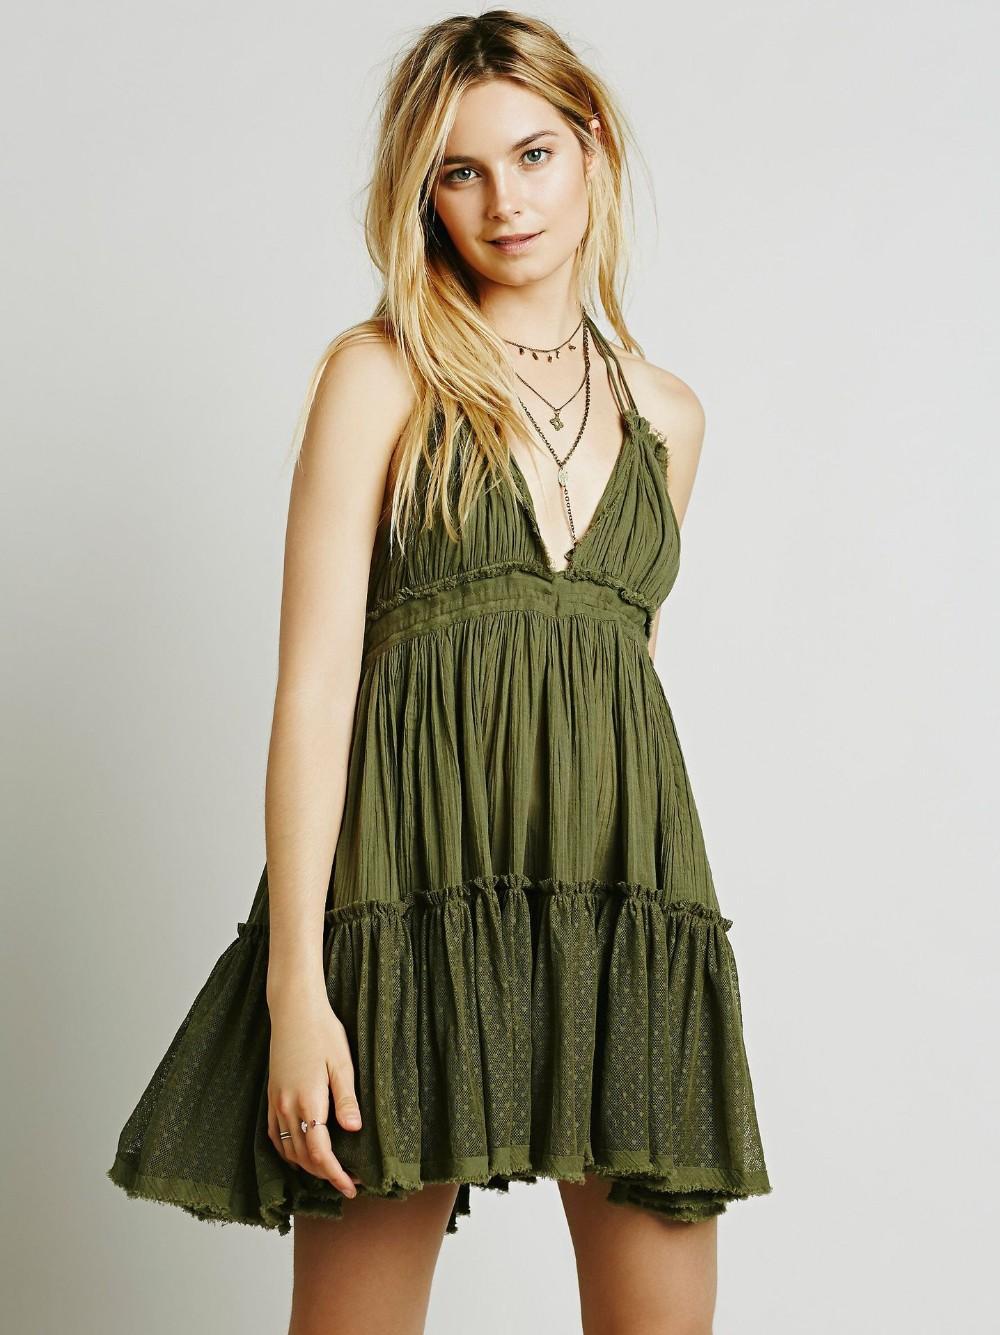 Women's Summer Halter Deep V Neck Sexy Patchwork Mini Short Dresses 3